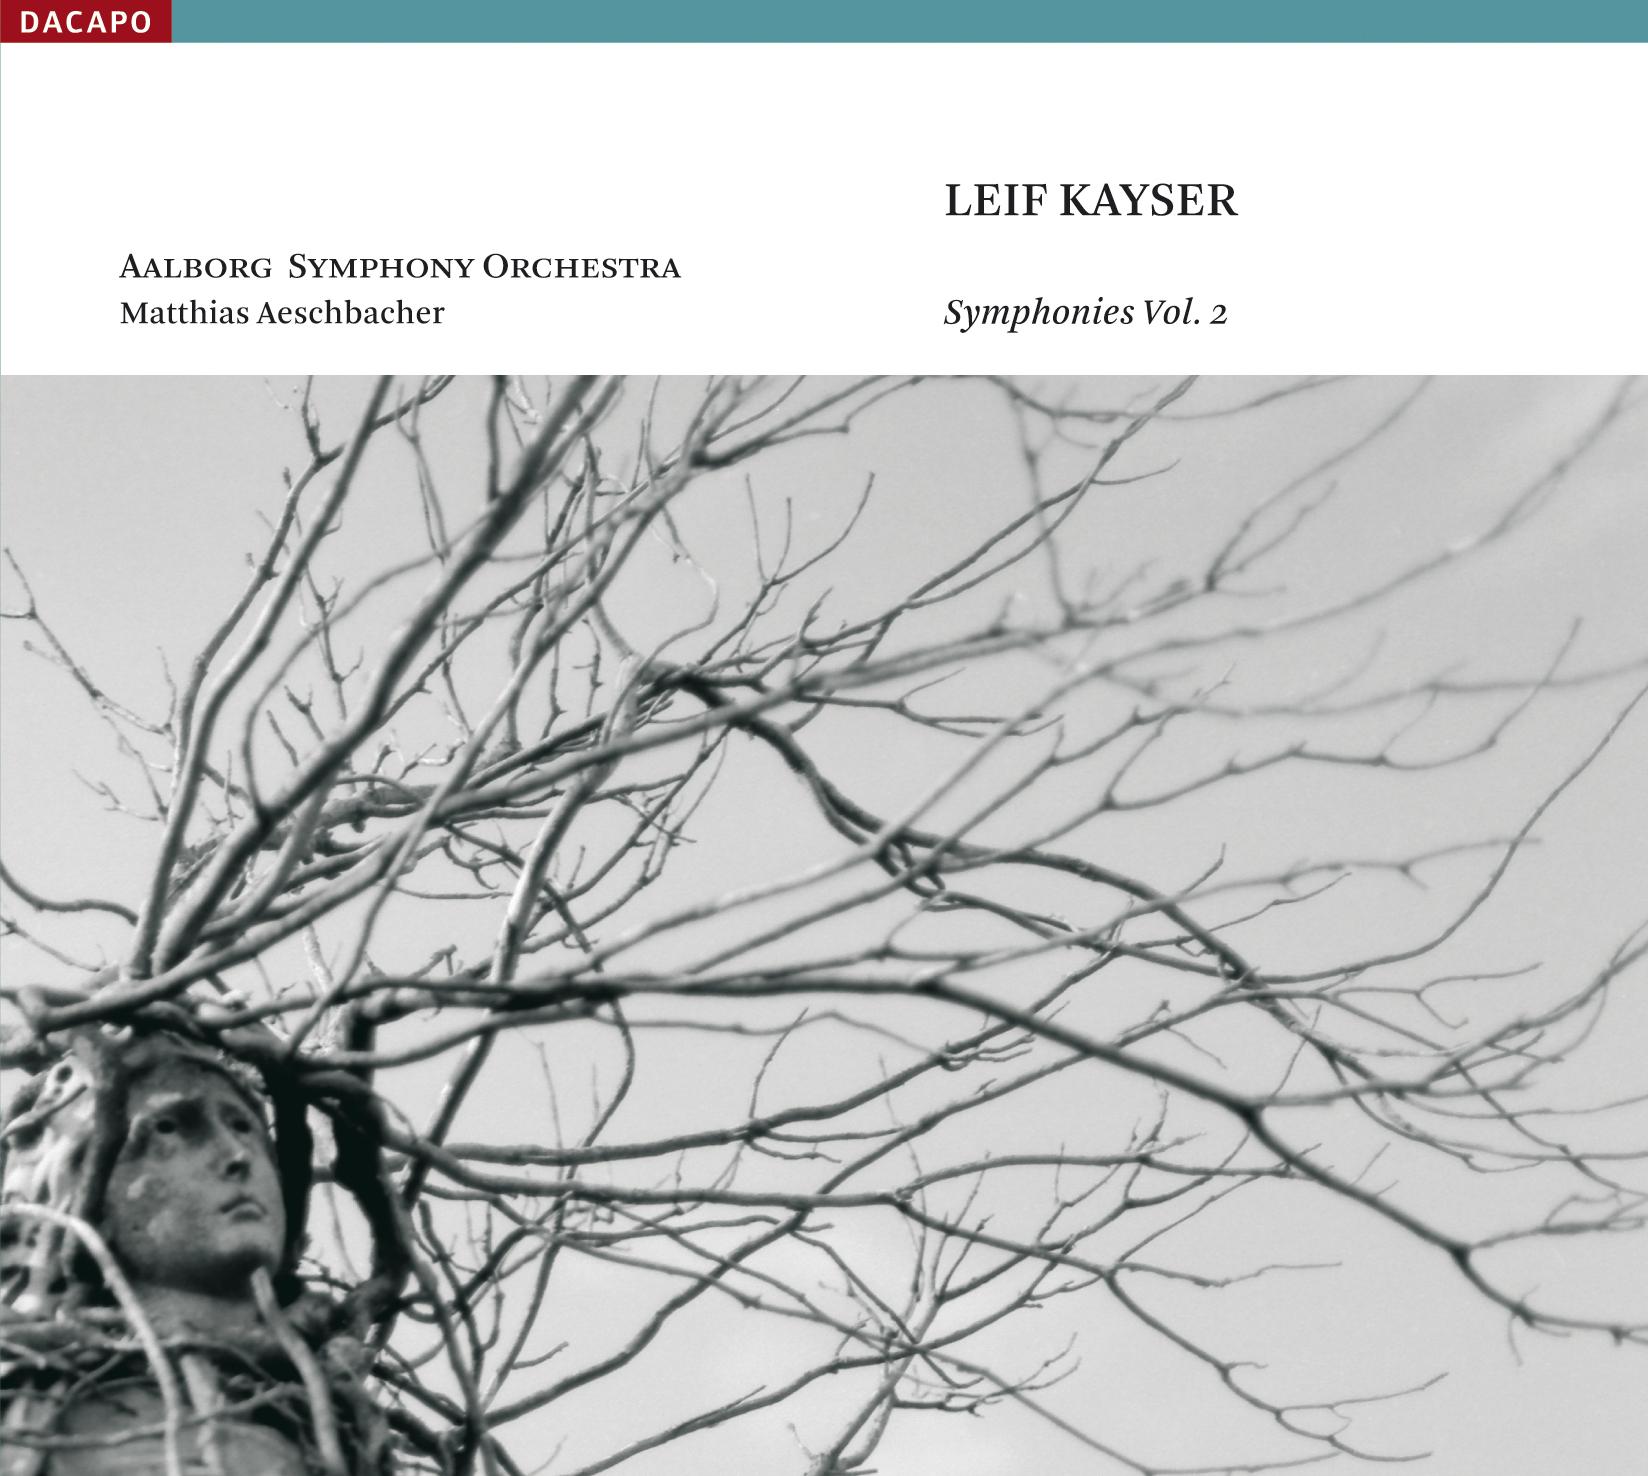 Symphonies Vol. 2 | Dacapo Records